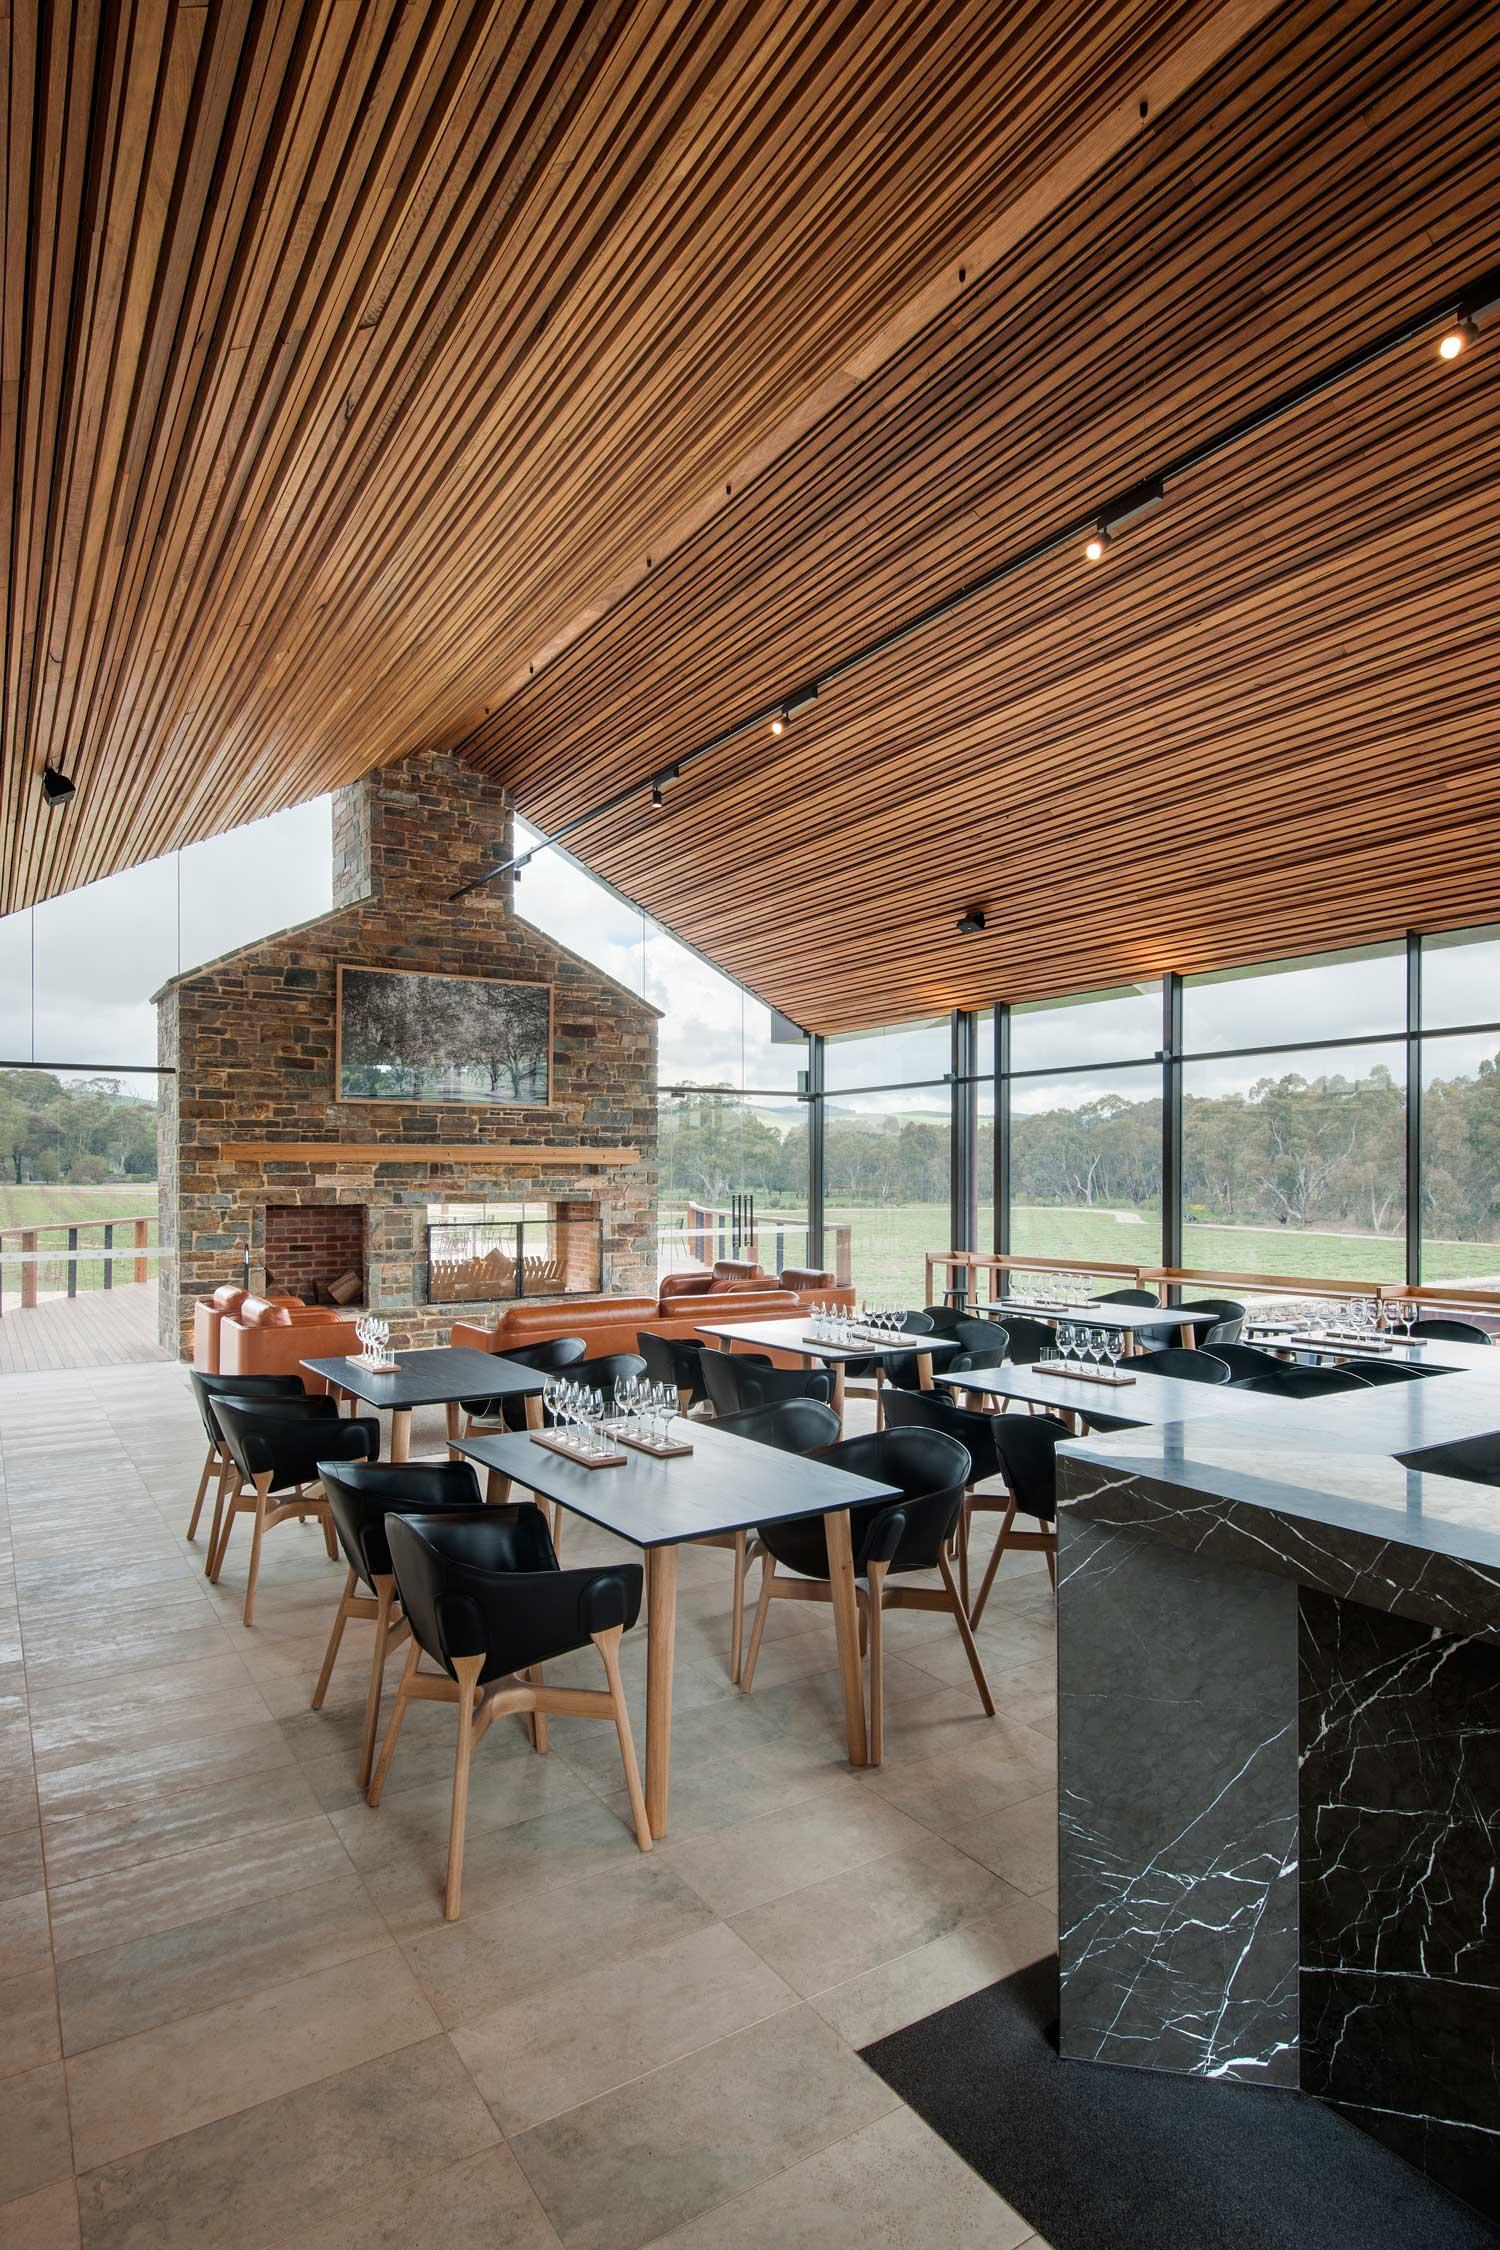 St-Hugo-Wine-Cellar-by-Studio-Gram-with-JBG-Architects-Yellowtrace-11.jpg